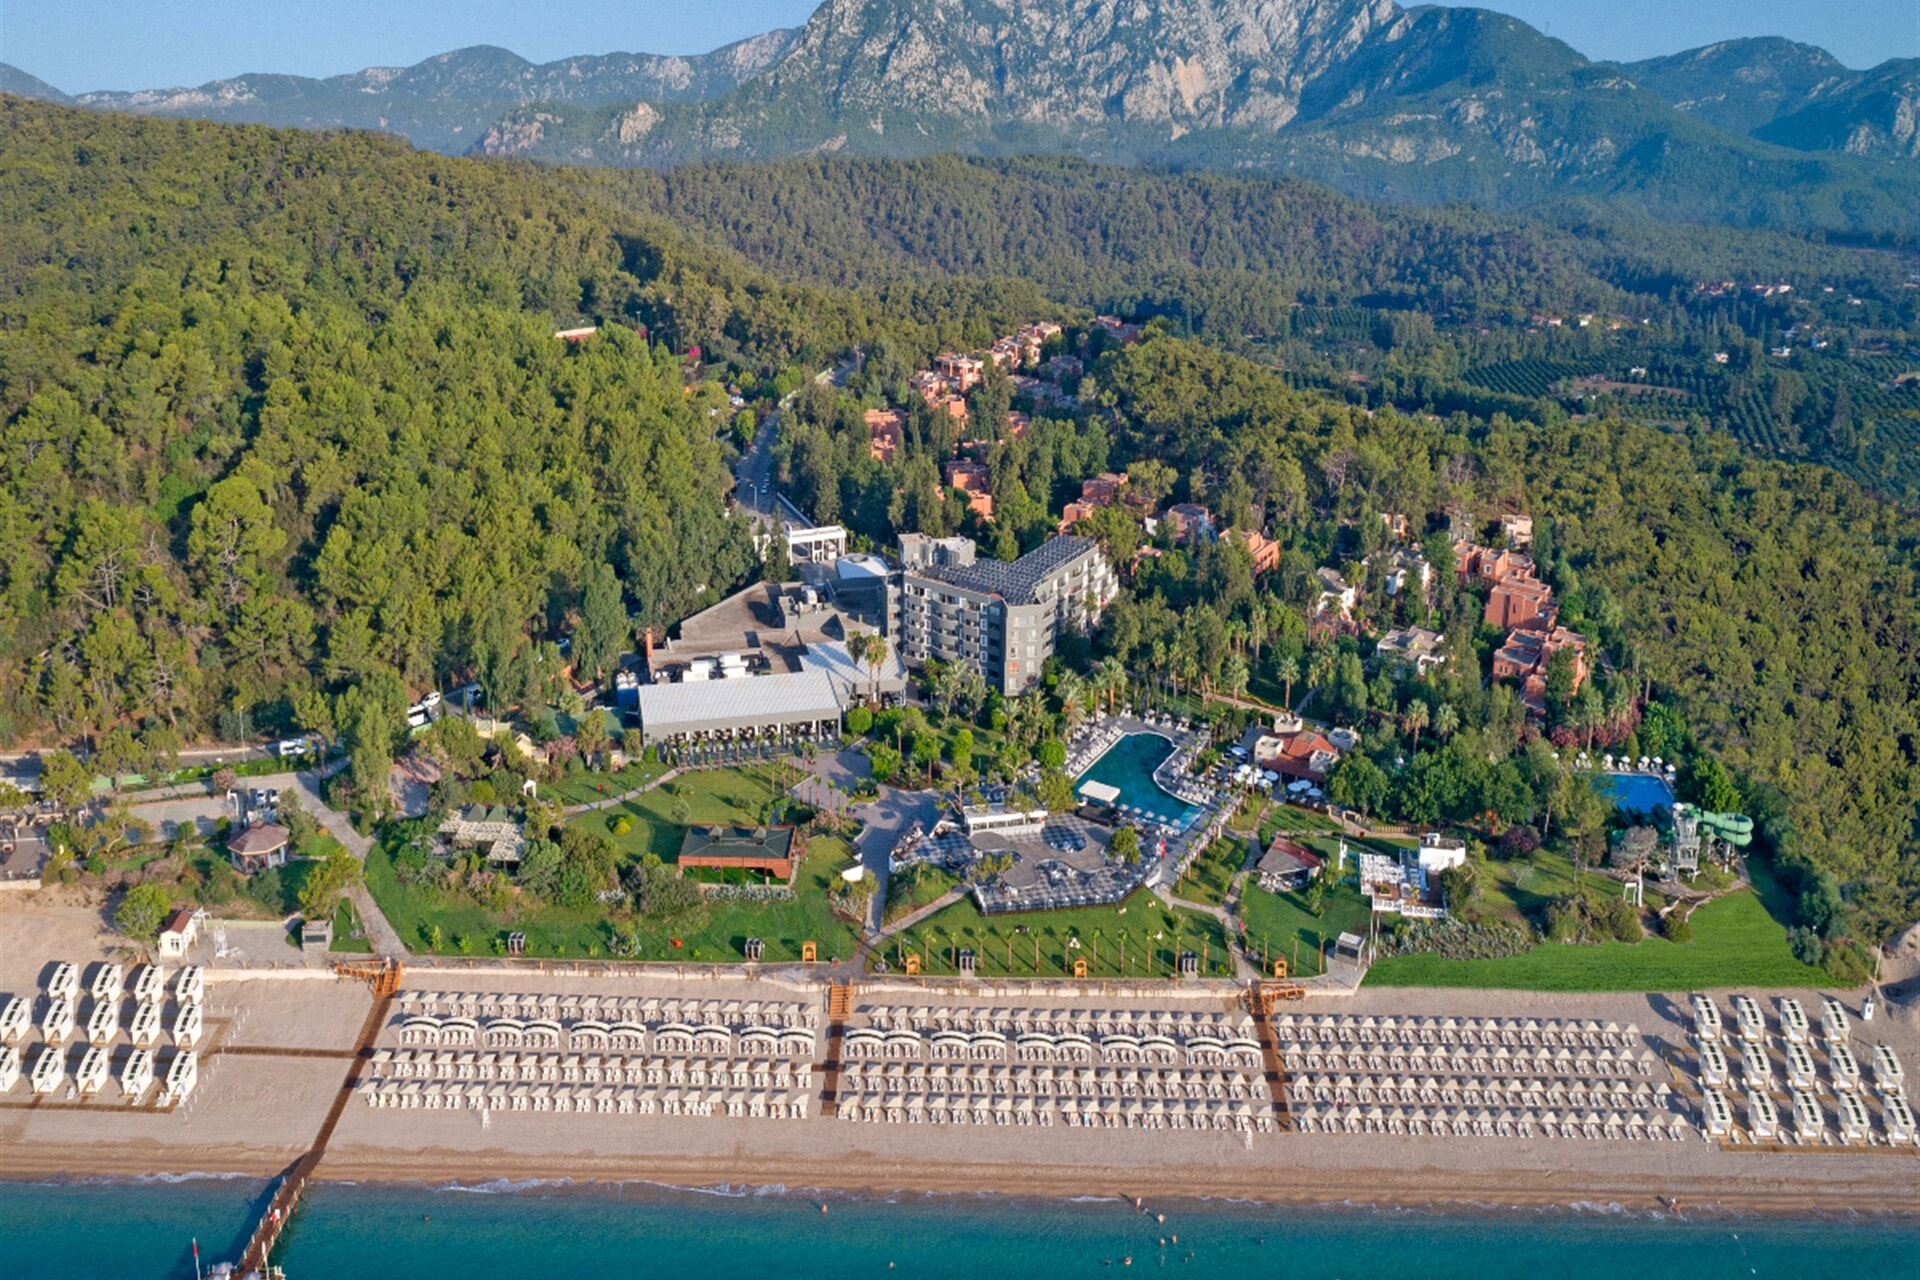 EUPHORIA TEKİROVA HOTEL – 5 Star Hotel and 1.class Holiday Village